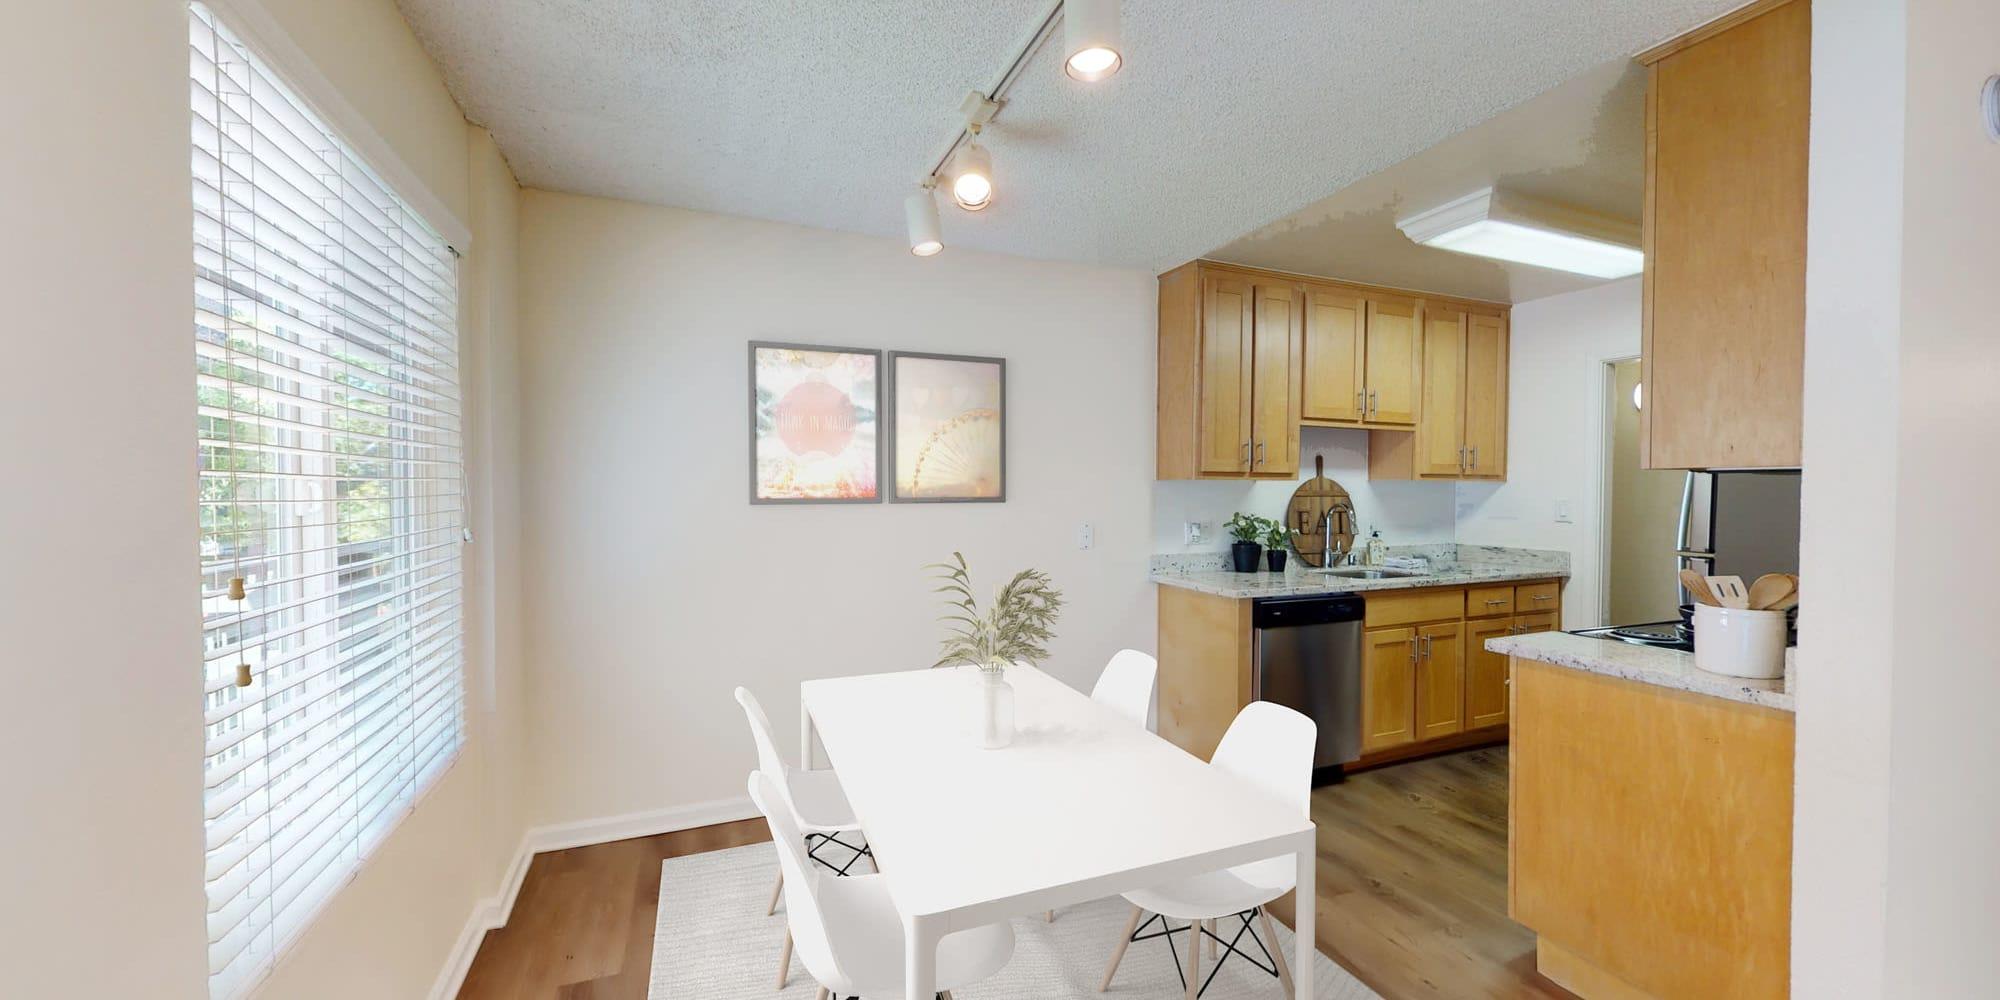 Track lighting above a model home's dining area at Pleasanton Glen Apartment Homes in Pleasanton, California